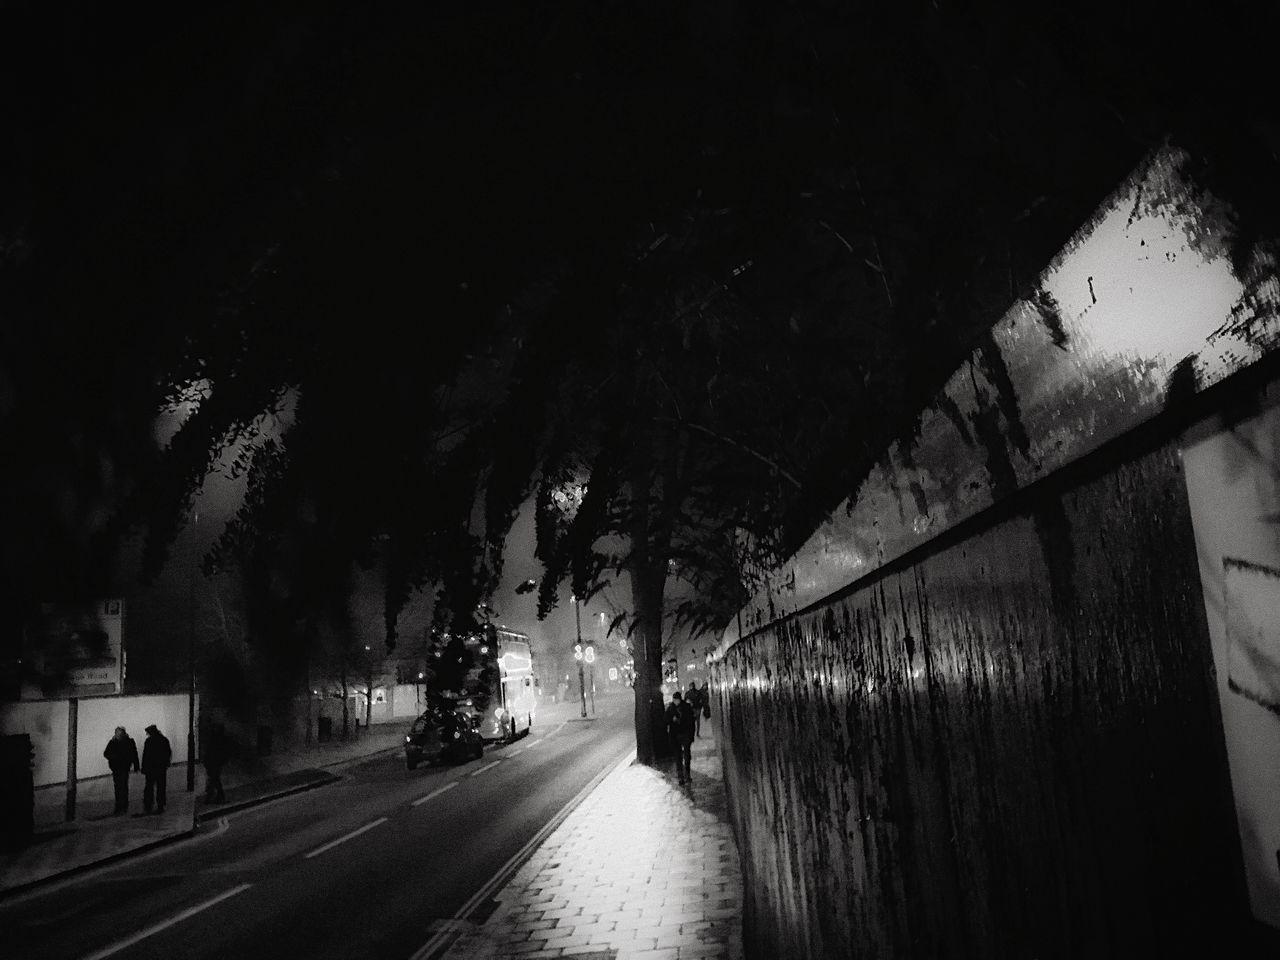 Tree Outdoors Real People Night Atmosphere London Lifestyle EyeEm Bnw EyeEm Best Shots - The Streets Street Light Street City EyeEm Best Shots - Black + White The Week Of Eyeem Black And White EyeEm Best Shots Fresh On Eyeem  Street Photography Reflections Silhouette Sidewalk Creative Photography Saturday Night